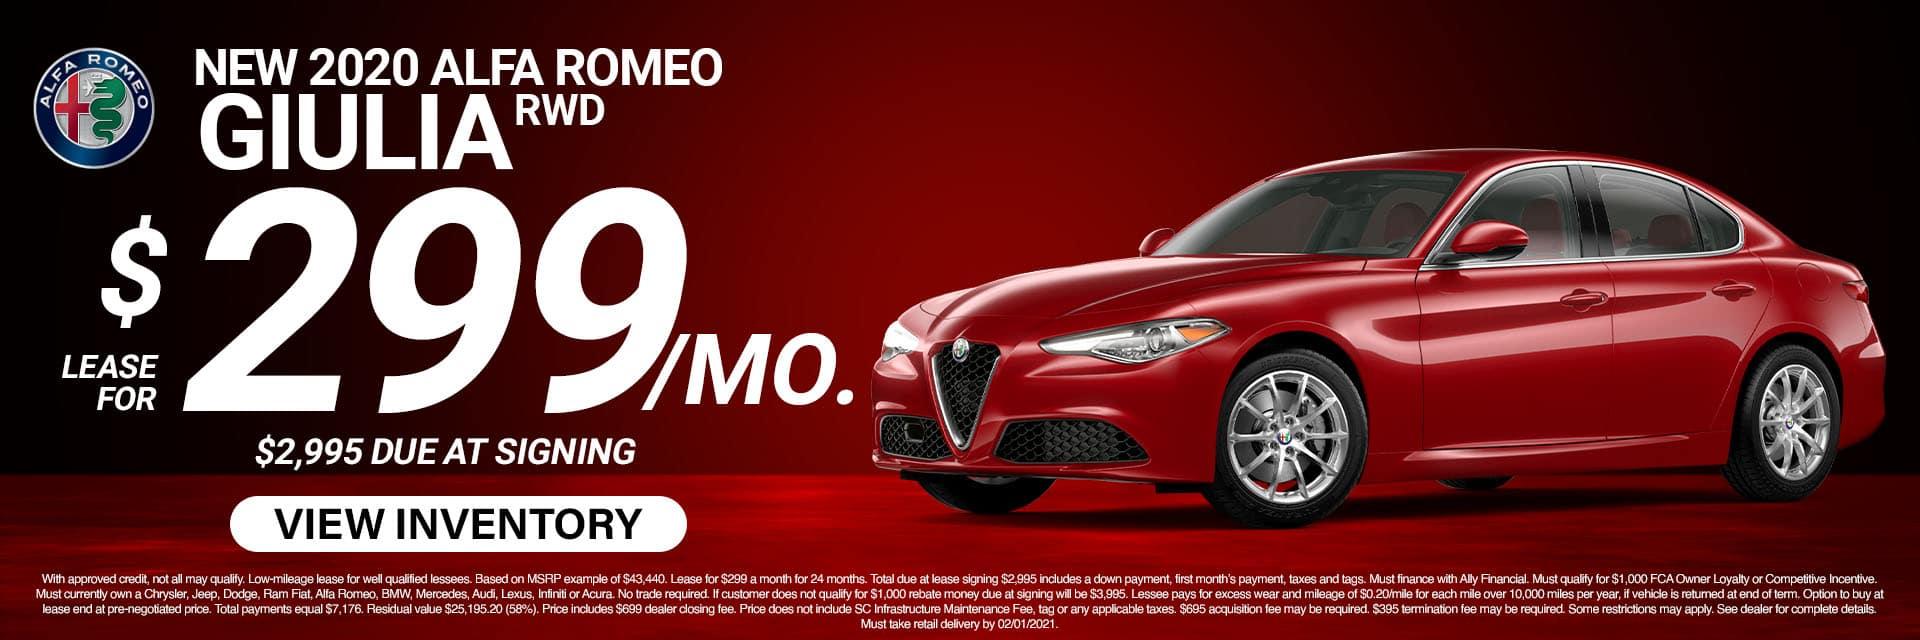 SLAR-January 20212020 Alfa Romeo Giulia